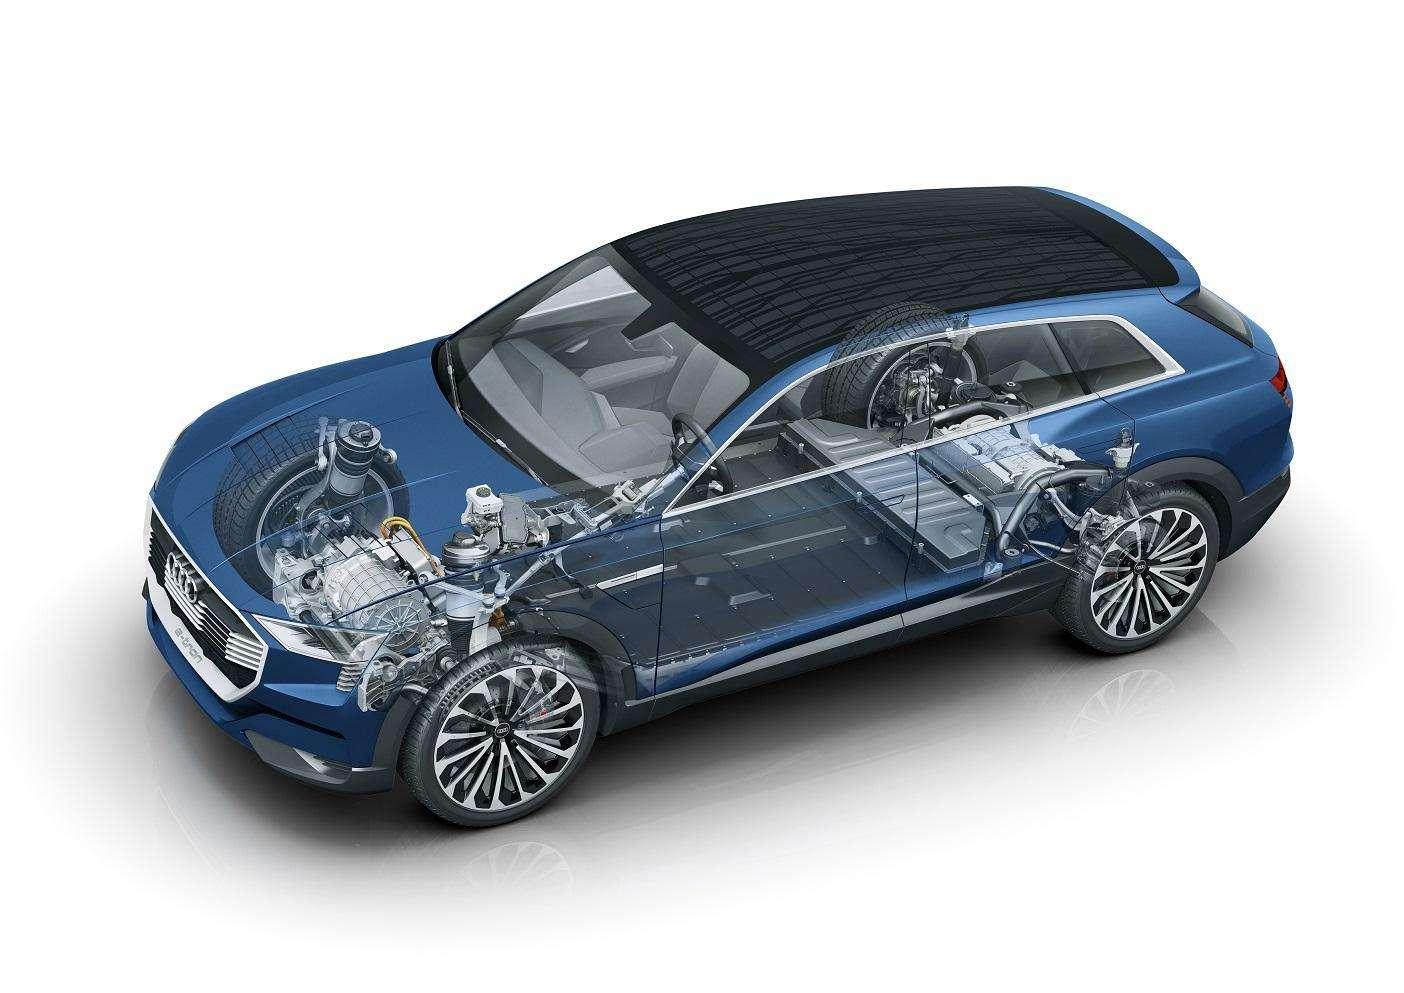 MINDSET - MODERN TALKING The Audi e-tron quattro concept